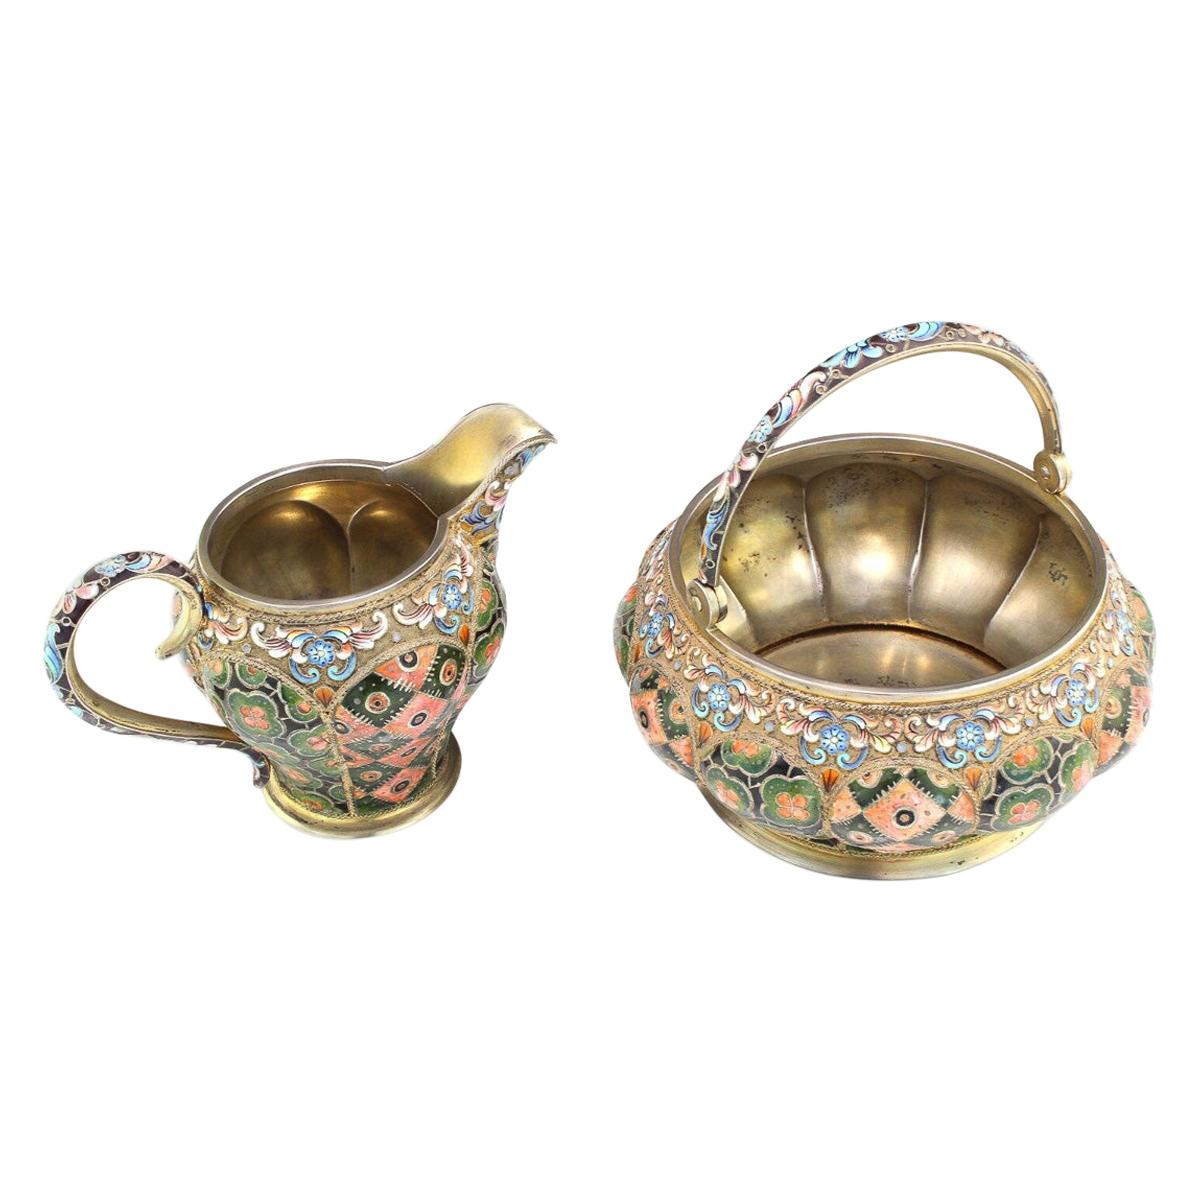 20th Century Russian Silver & Enamel Sugar Bowl & Cream Jug, 6th Artel, c.1910